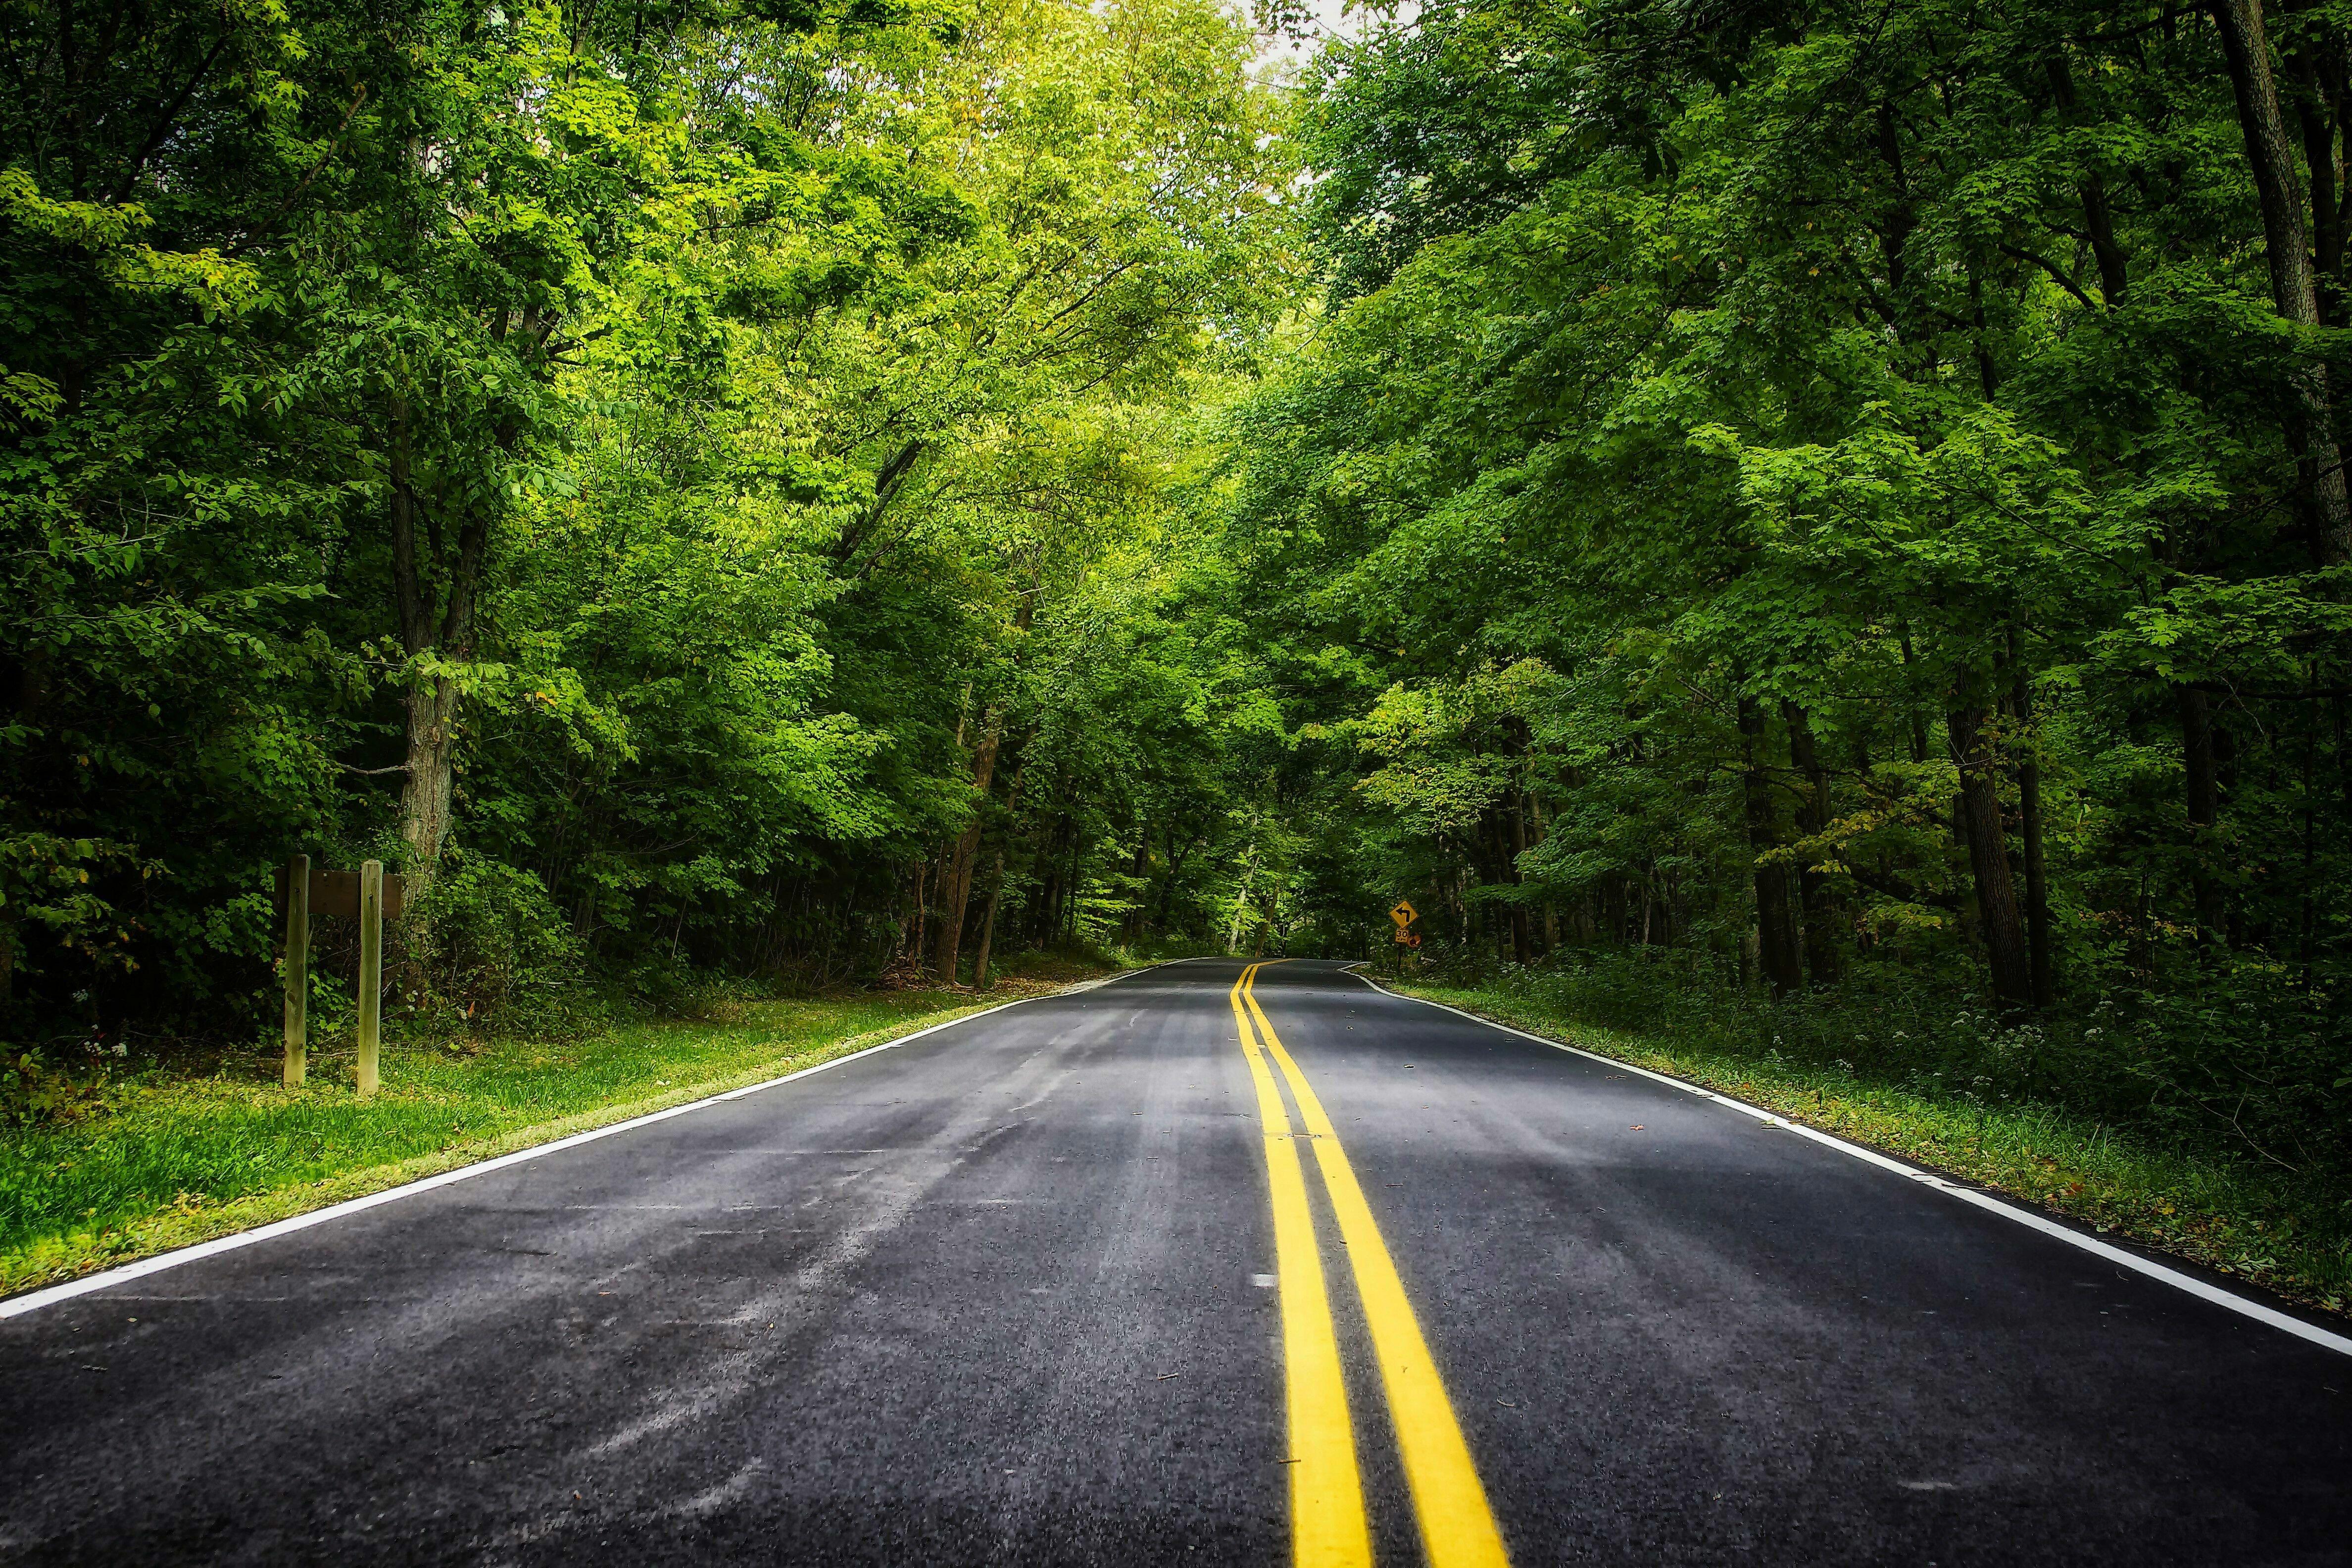 Road Forest Trees Landscape Wallpaper 4752x3168 468802